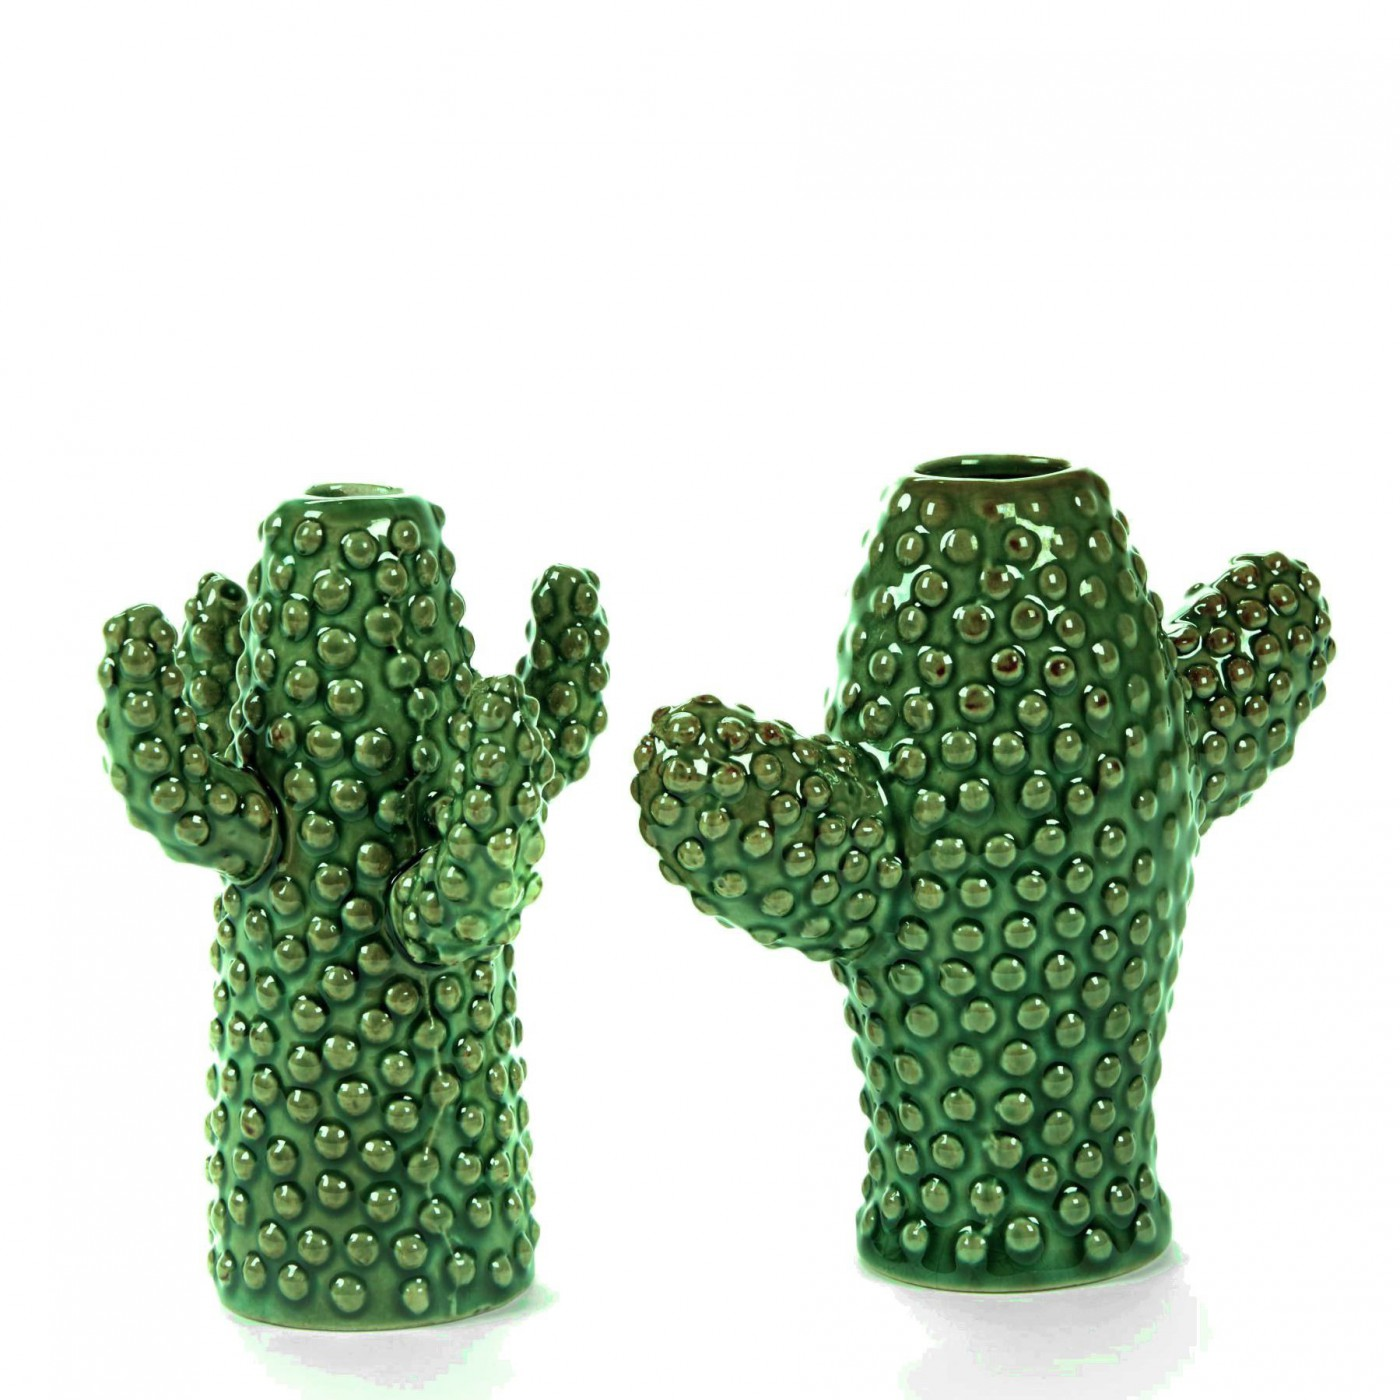 Lot de 2 vases cactus mini porcelaine verte